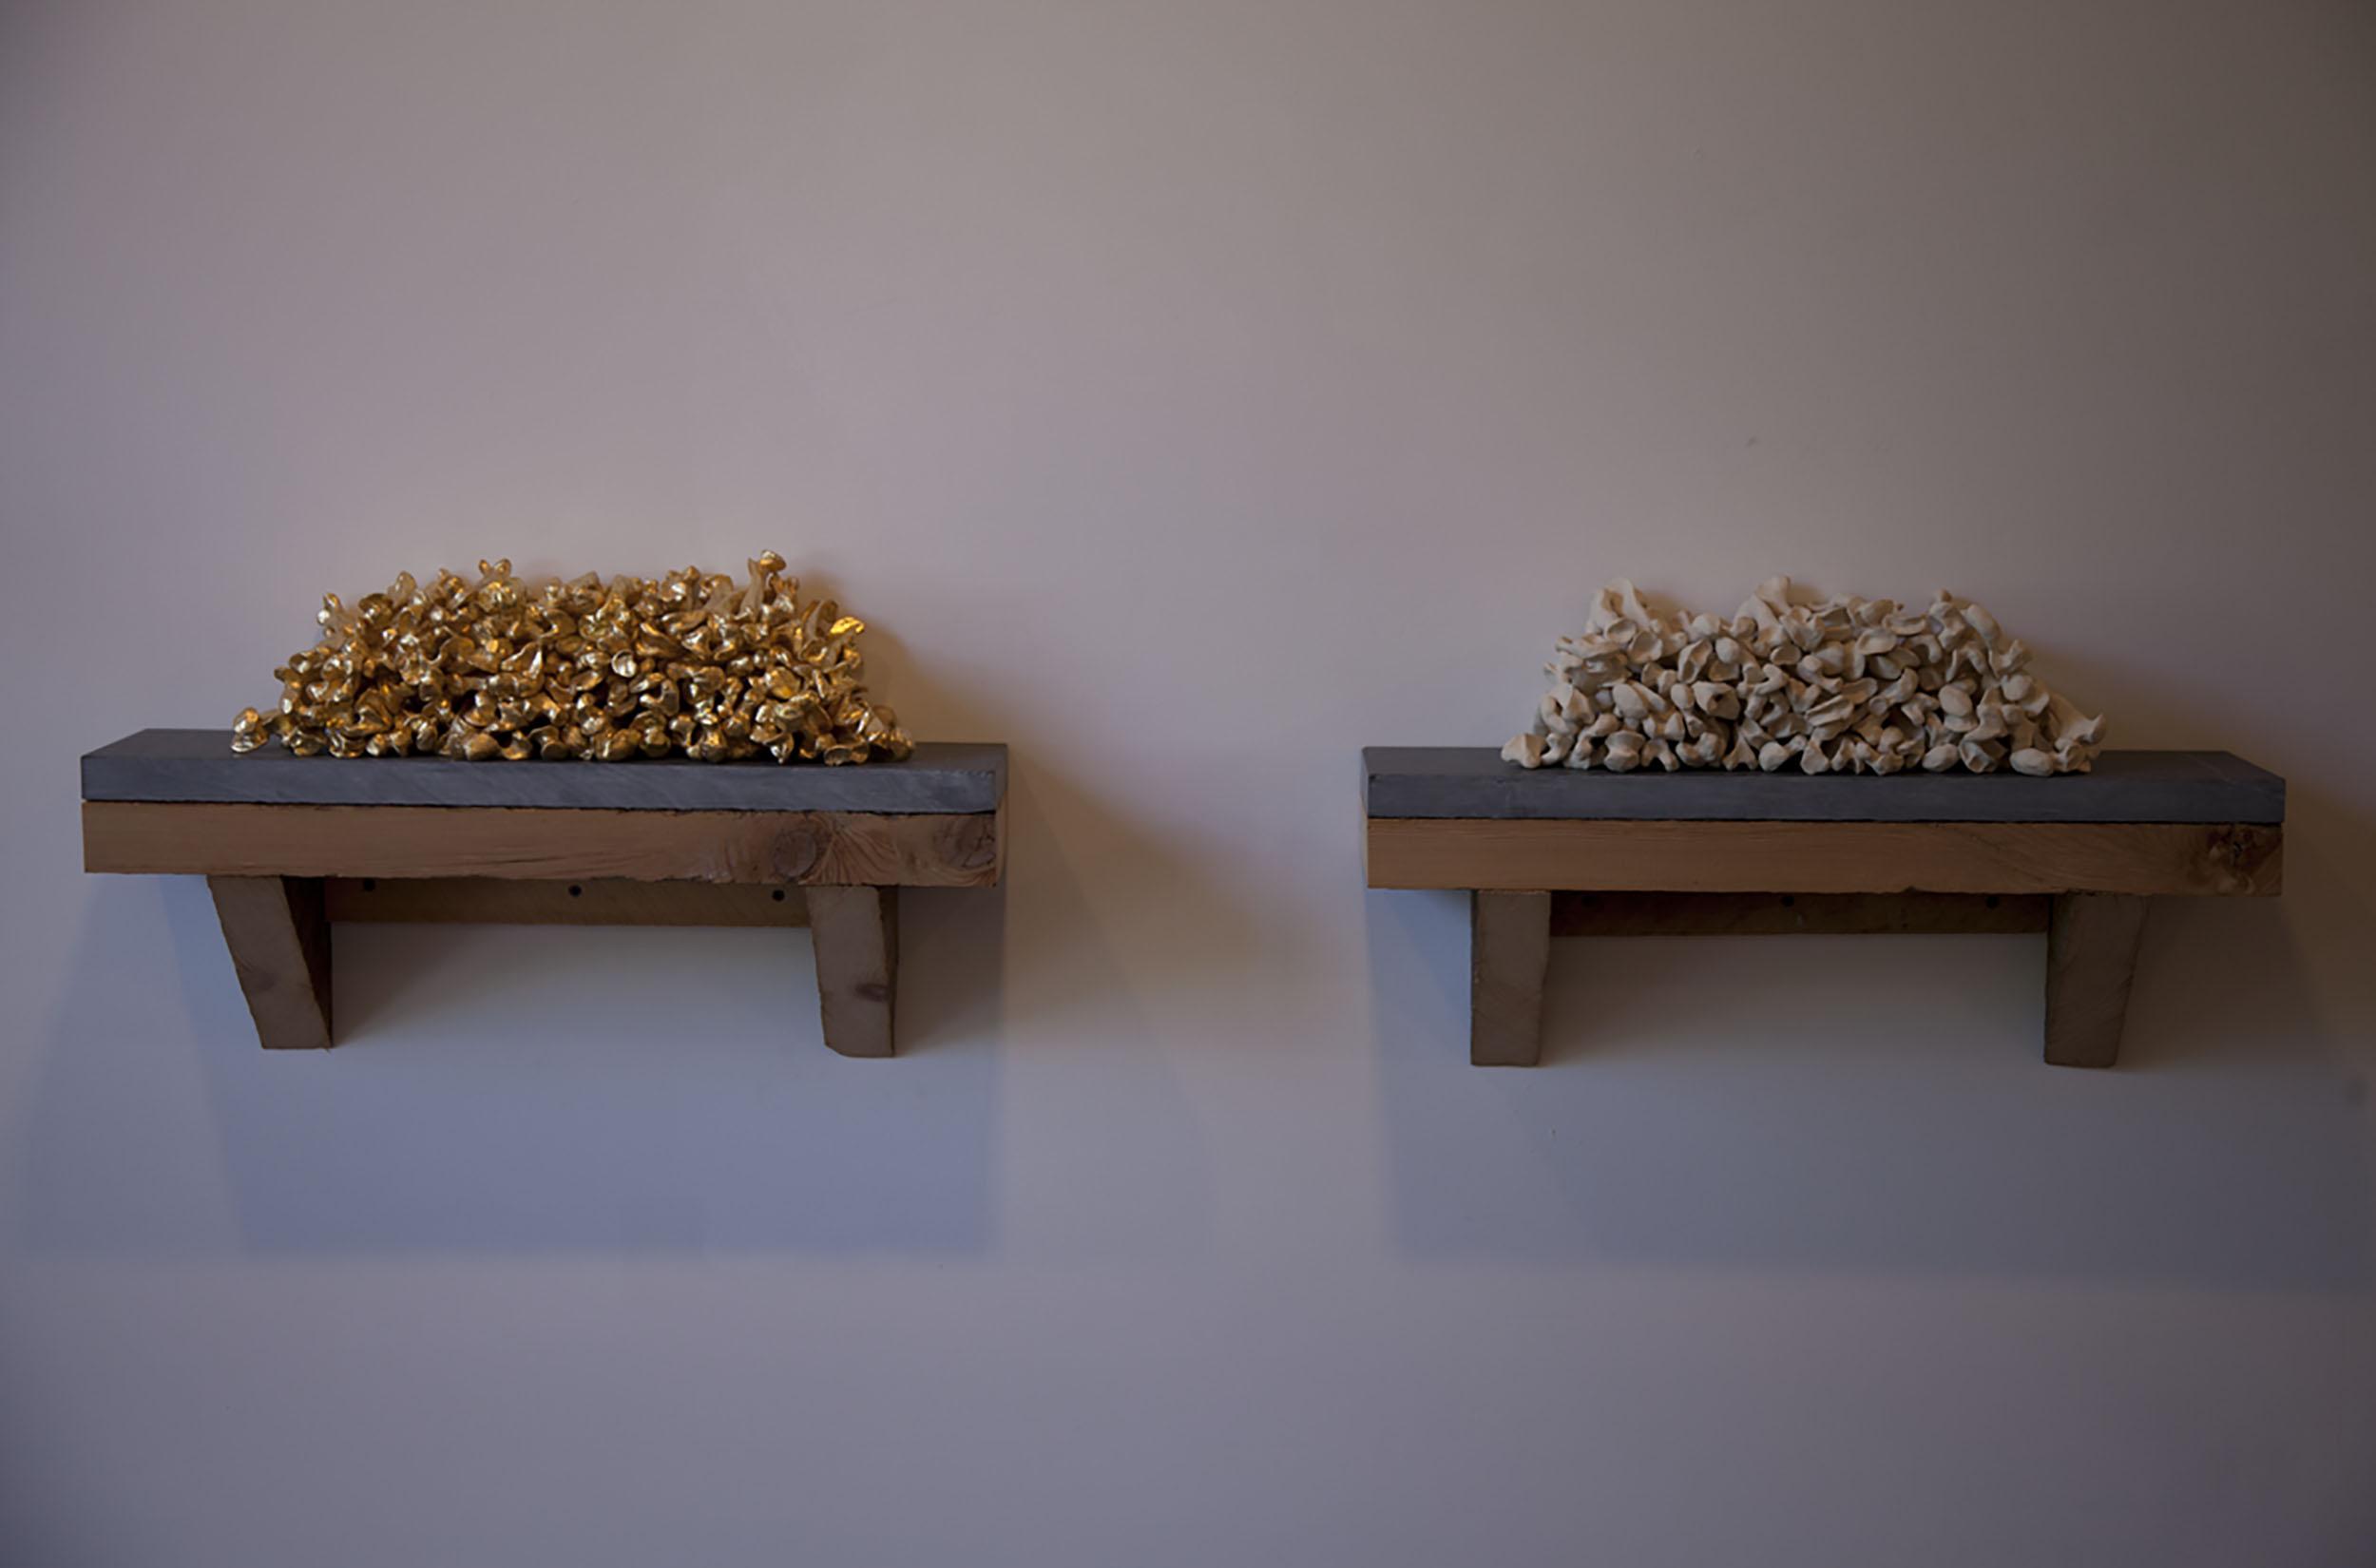 Eve-Biddle-Artworks-Catacombs-2010-03